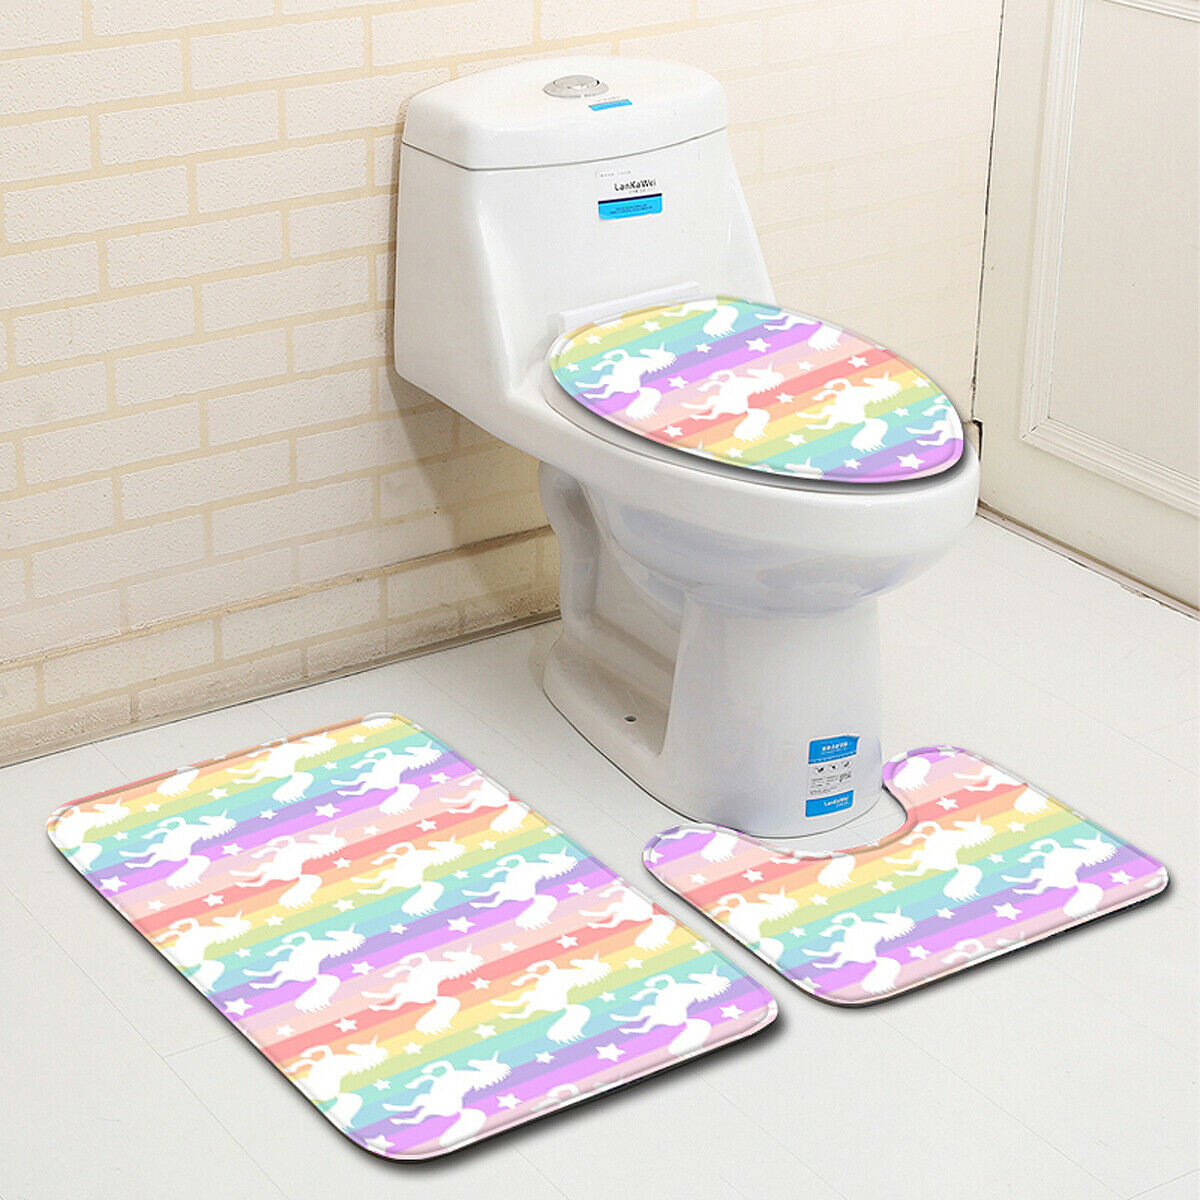 3pcs//set Polyester Fiber Bathroom Non-Slip Pedestal Rug Lid Toilet Cover BathMat